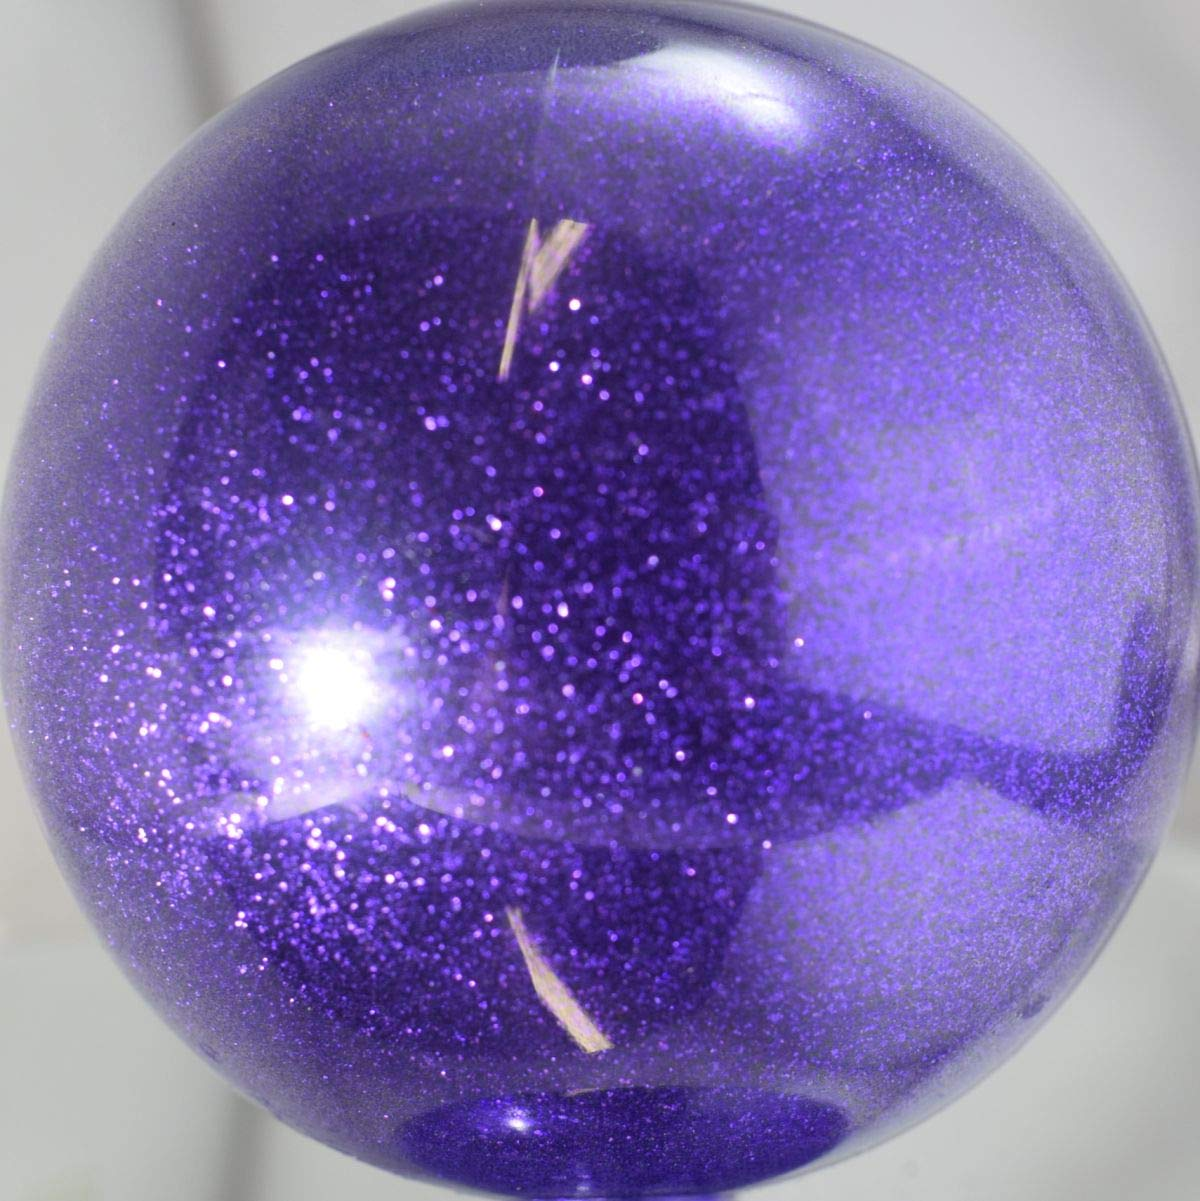 Vintage Paint Plum Crazy Purple Metal Flake Glitter .008 0.008 Hex (Pound)